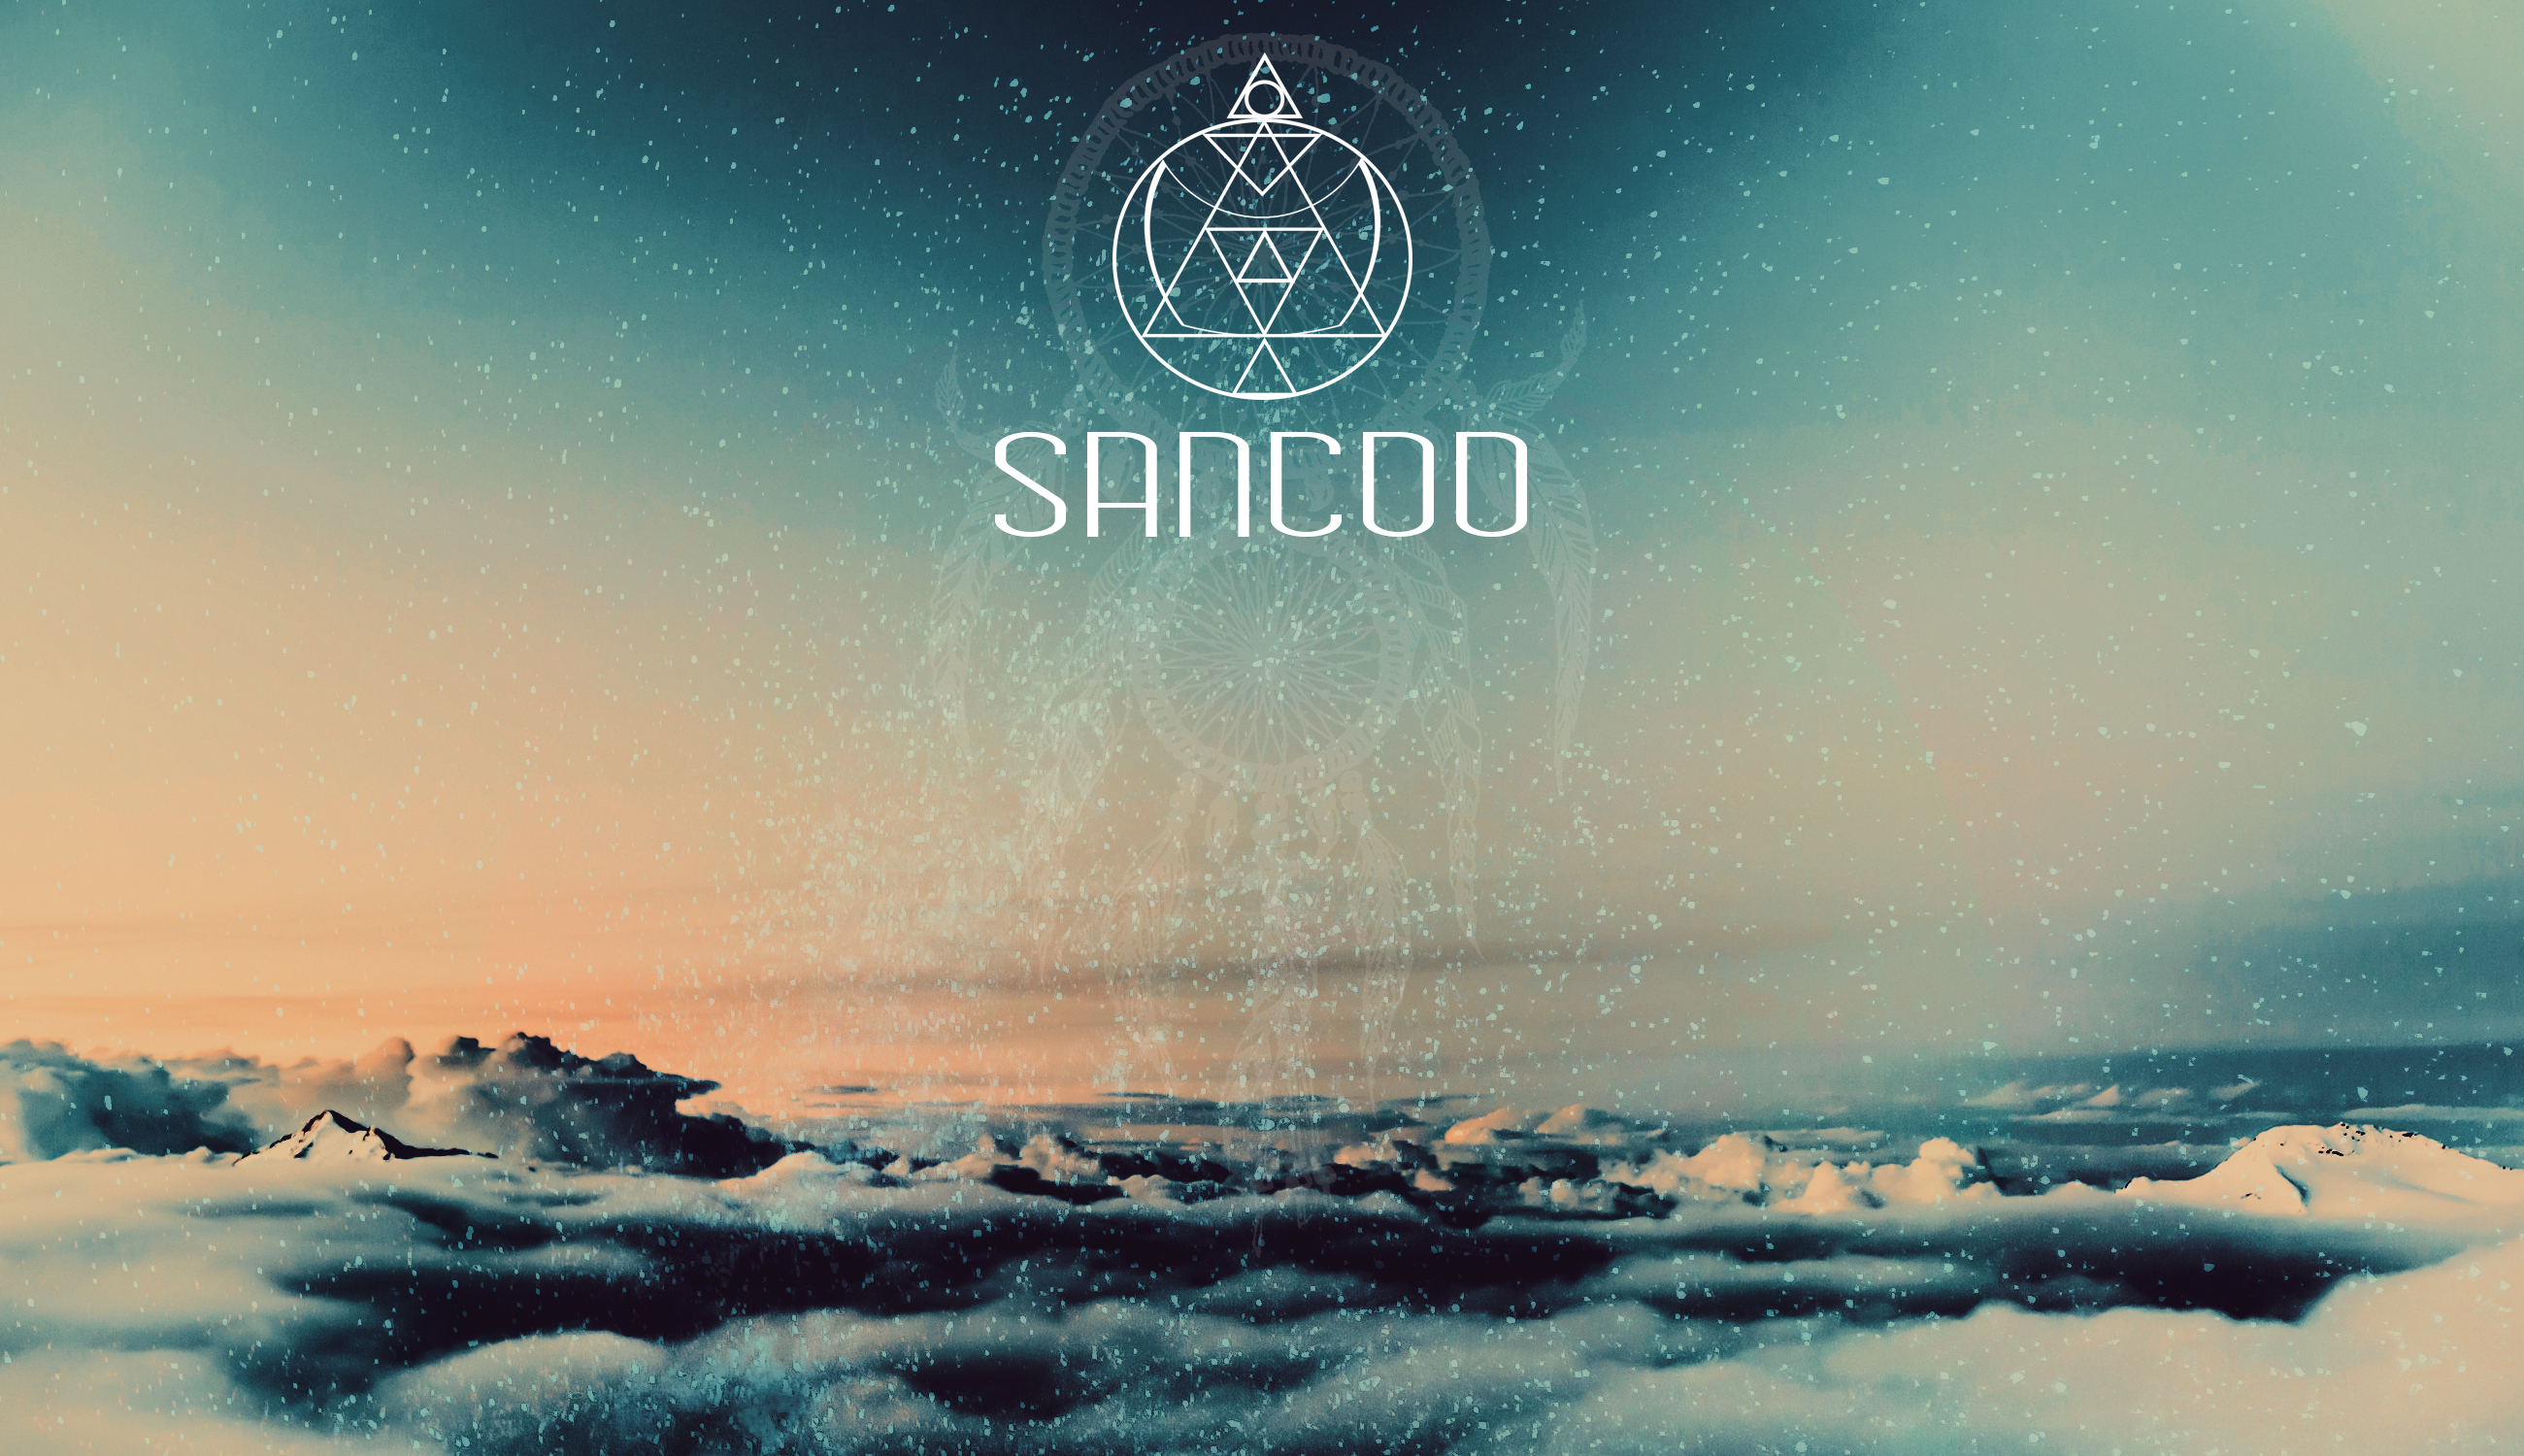 Sancoo Sky